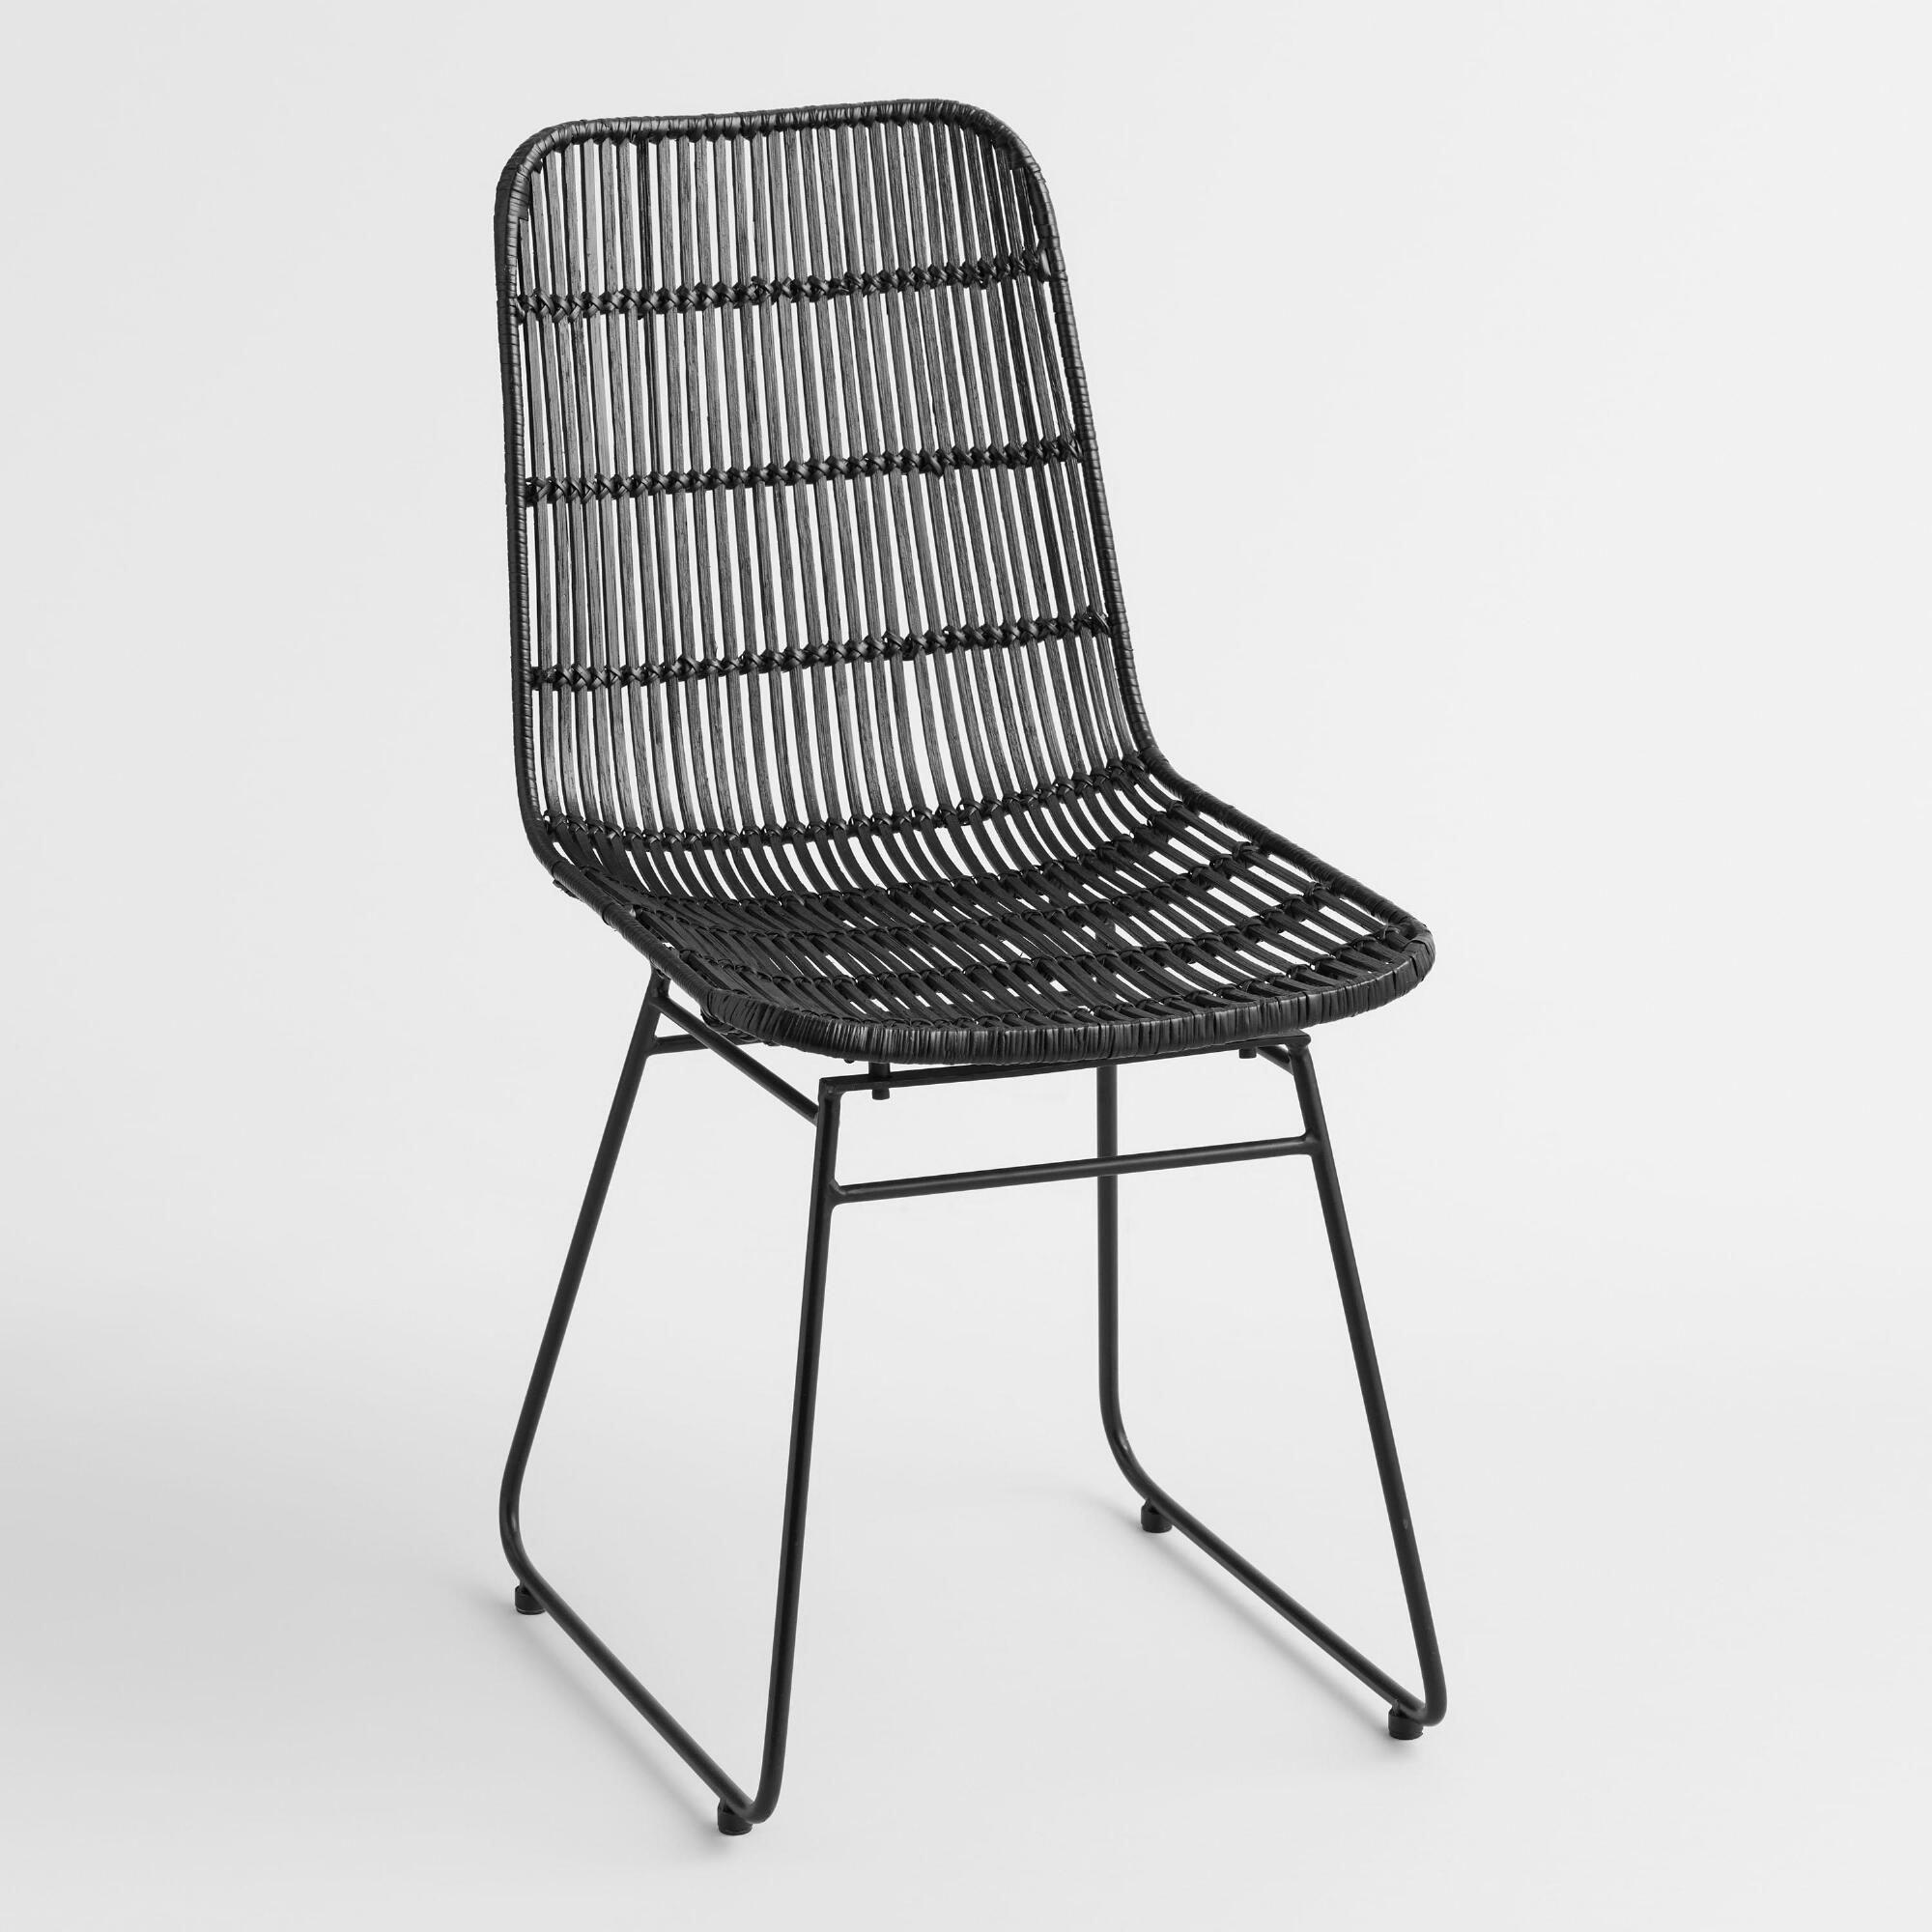 Black Wicker Emily Chair By World Market Worldmarketchair Chair